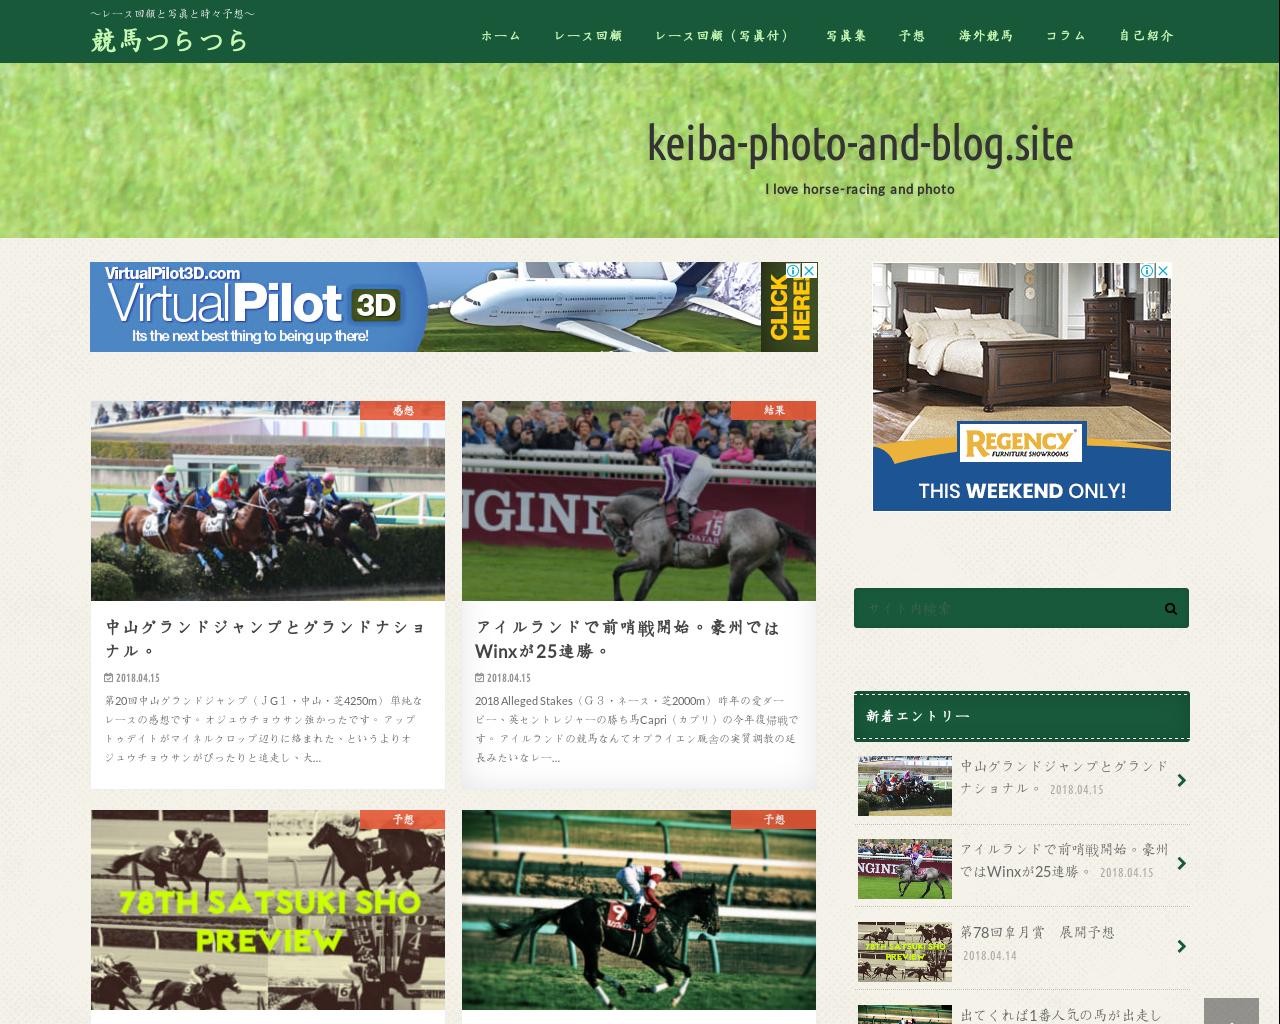 keiba-photo-and-blog.site(2018/04/15 20:40:42)